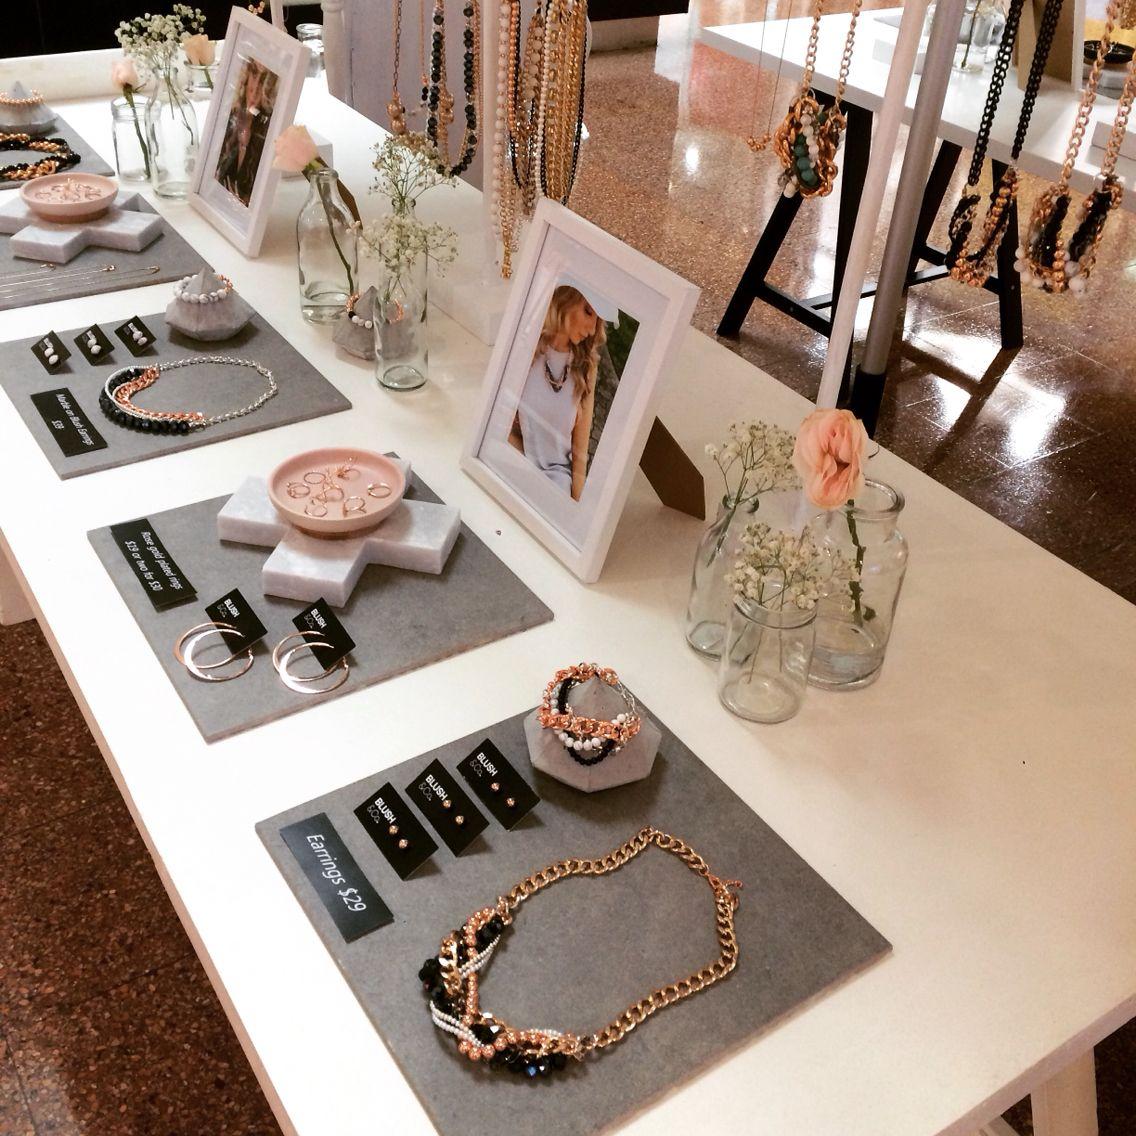 Visual Merchandising Pop Up Space Jewelry Shop Display Jewelry